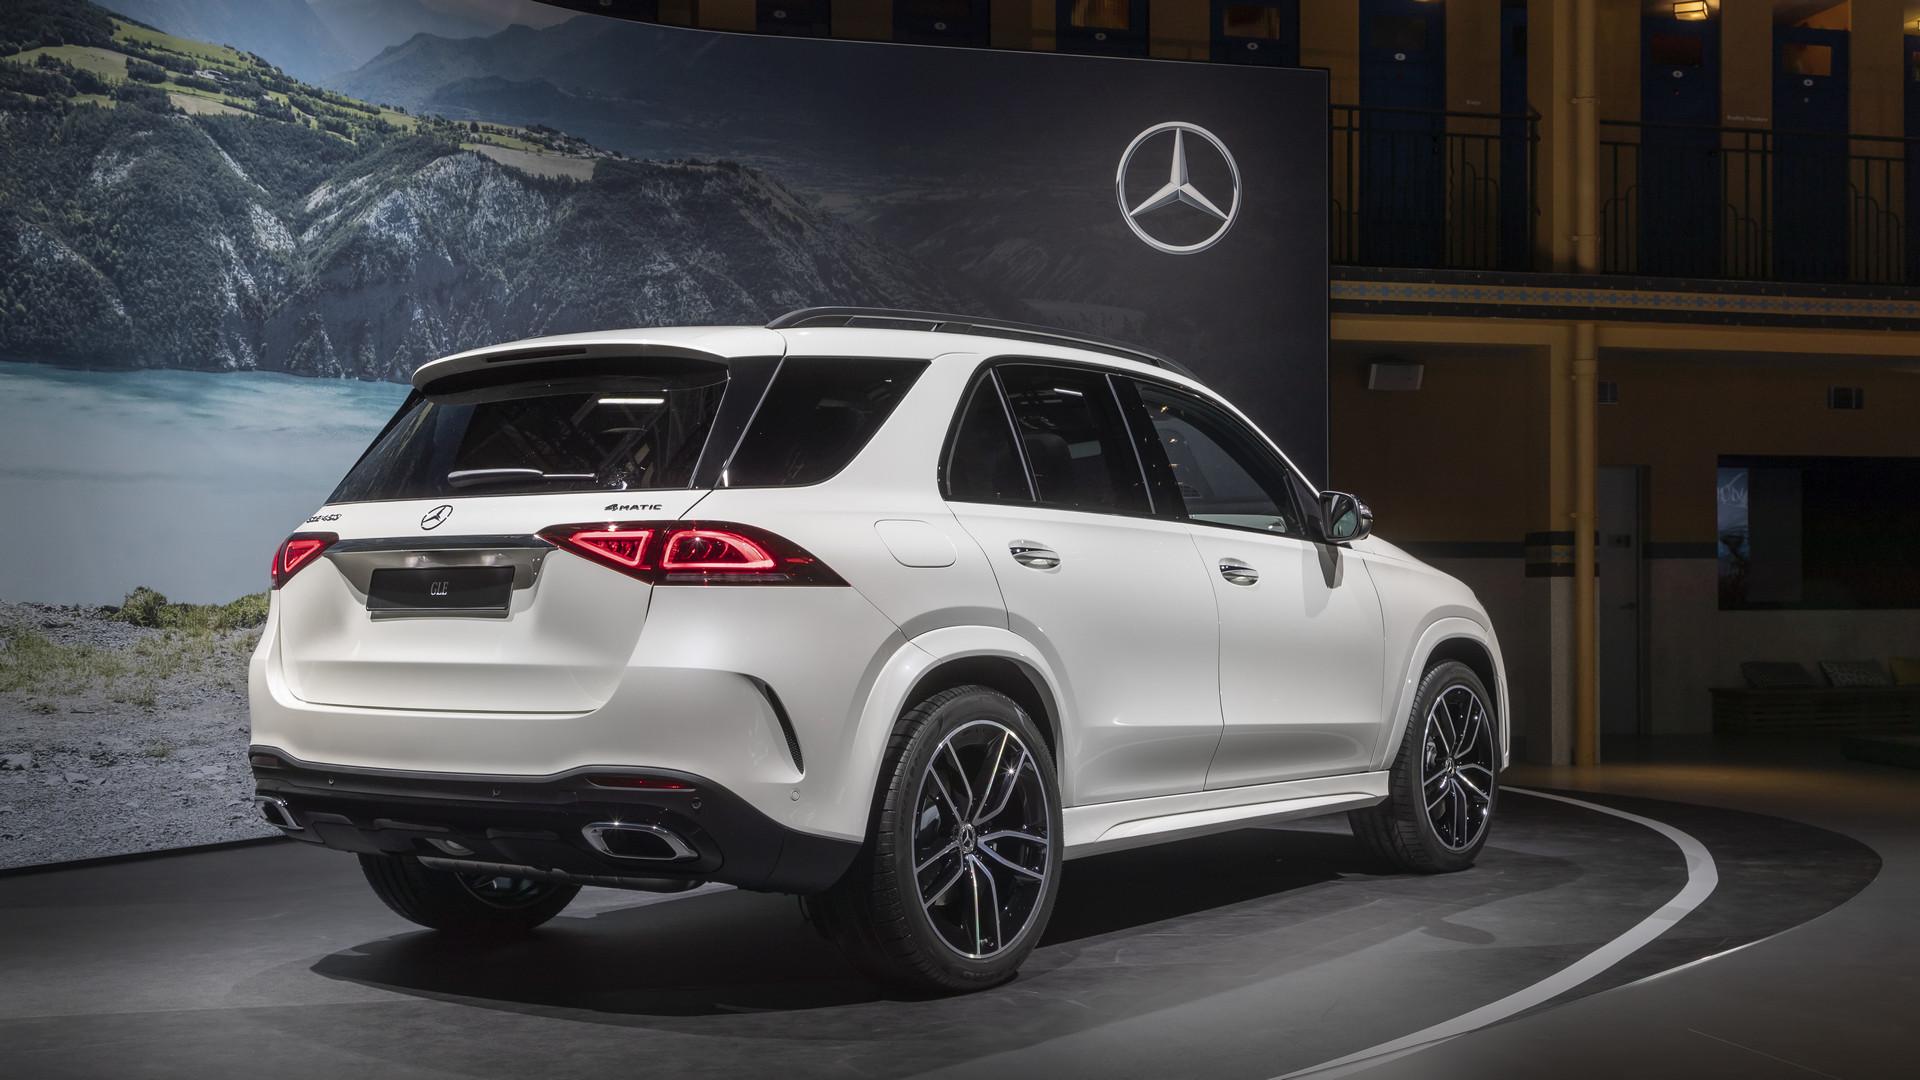 2019 Mercedes-Benz GLE 450 - Rear